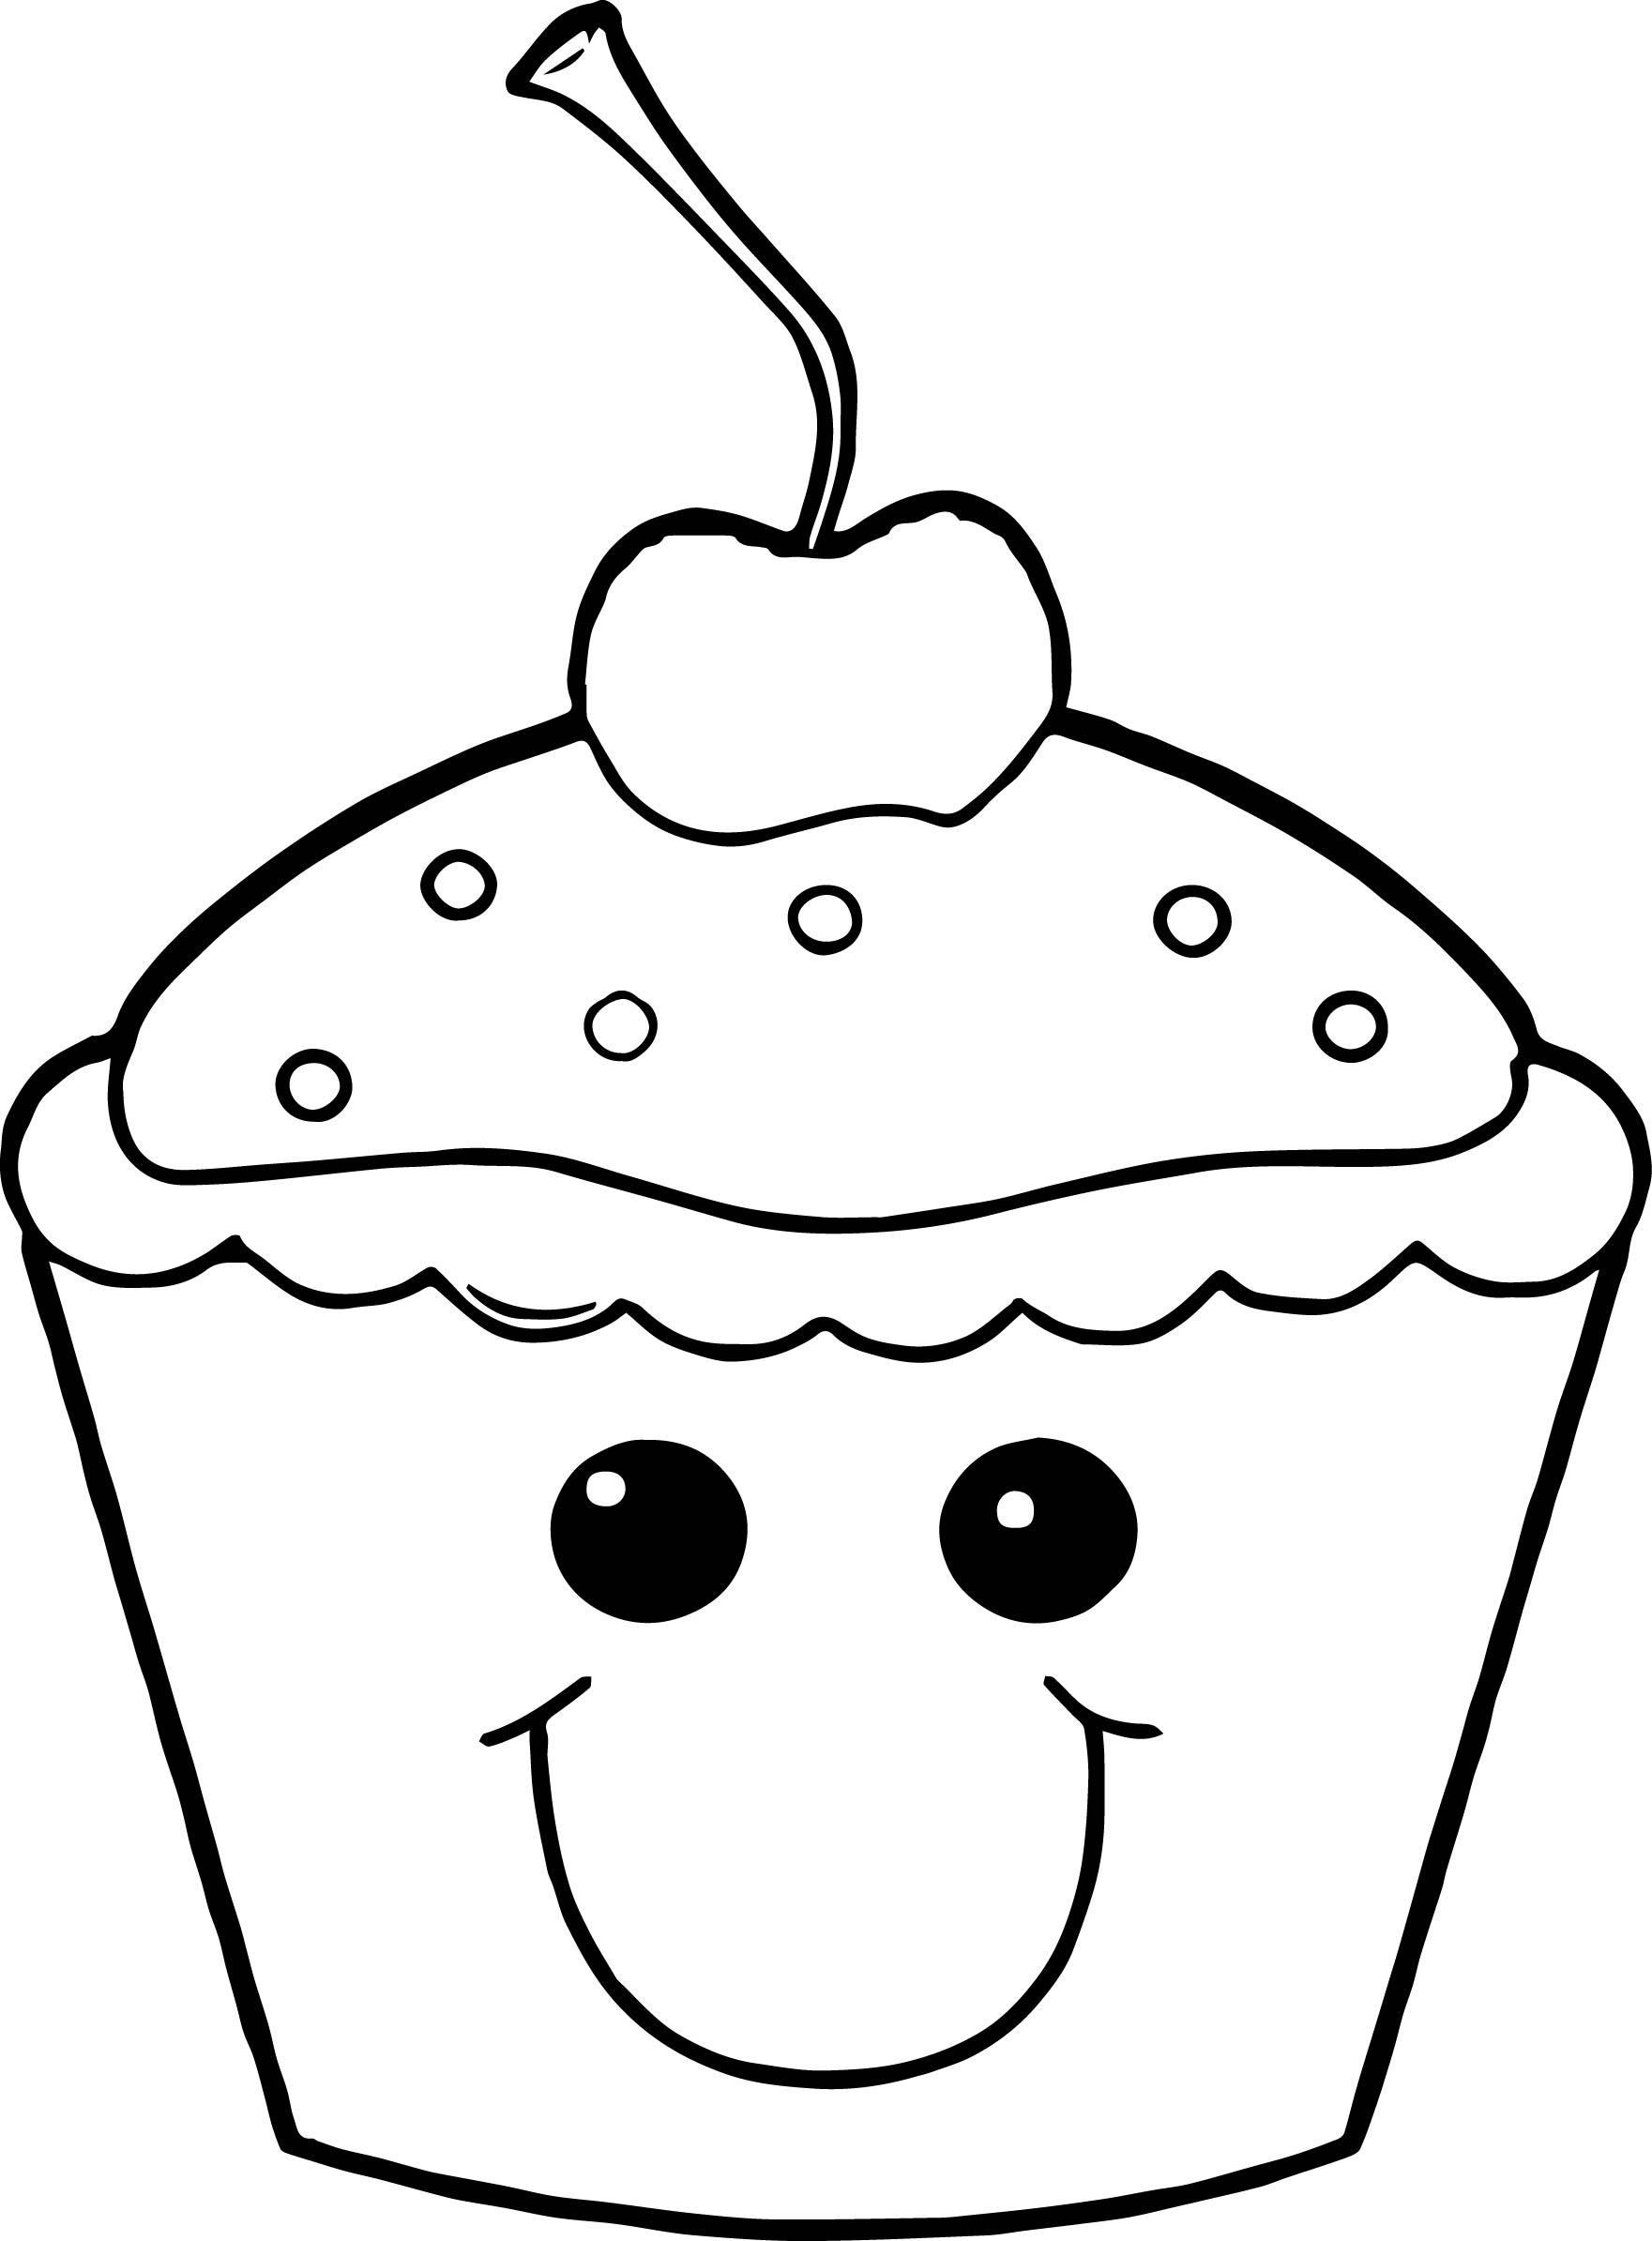 Very Cute Cartoon Smile Cupcake Coloring Page